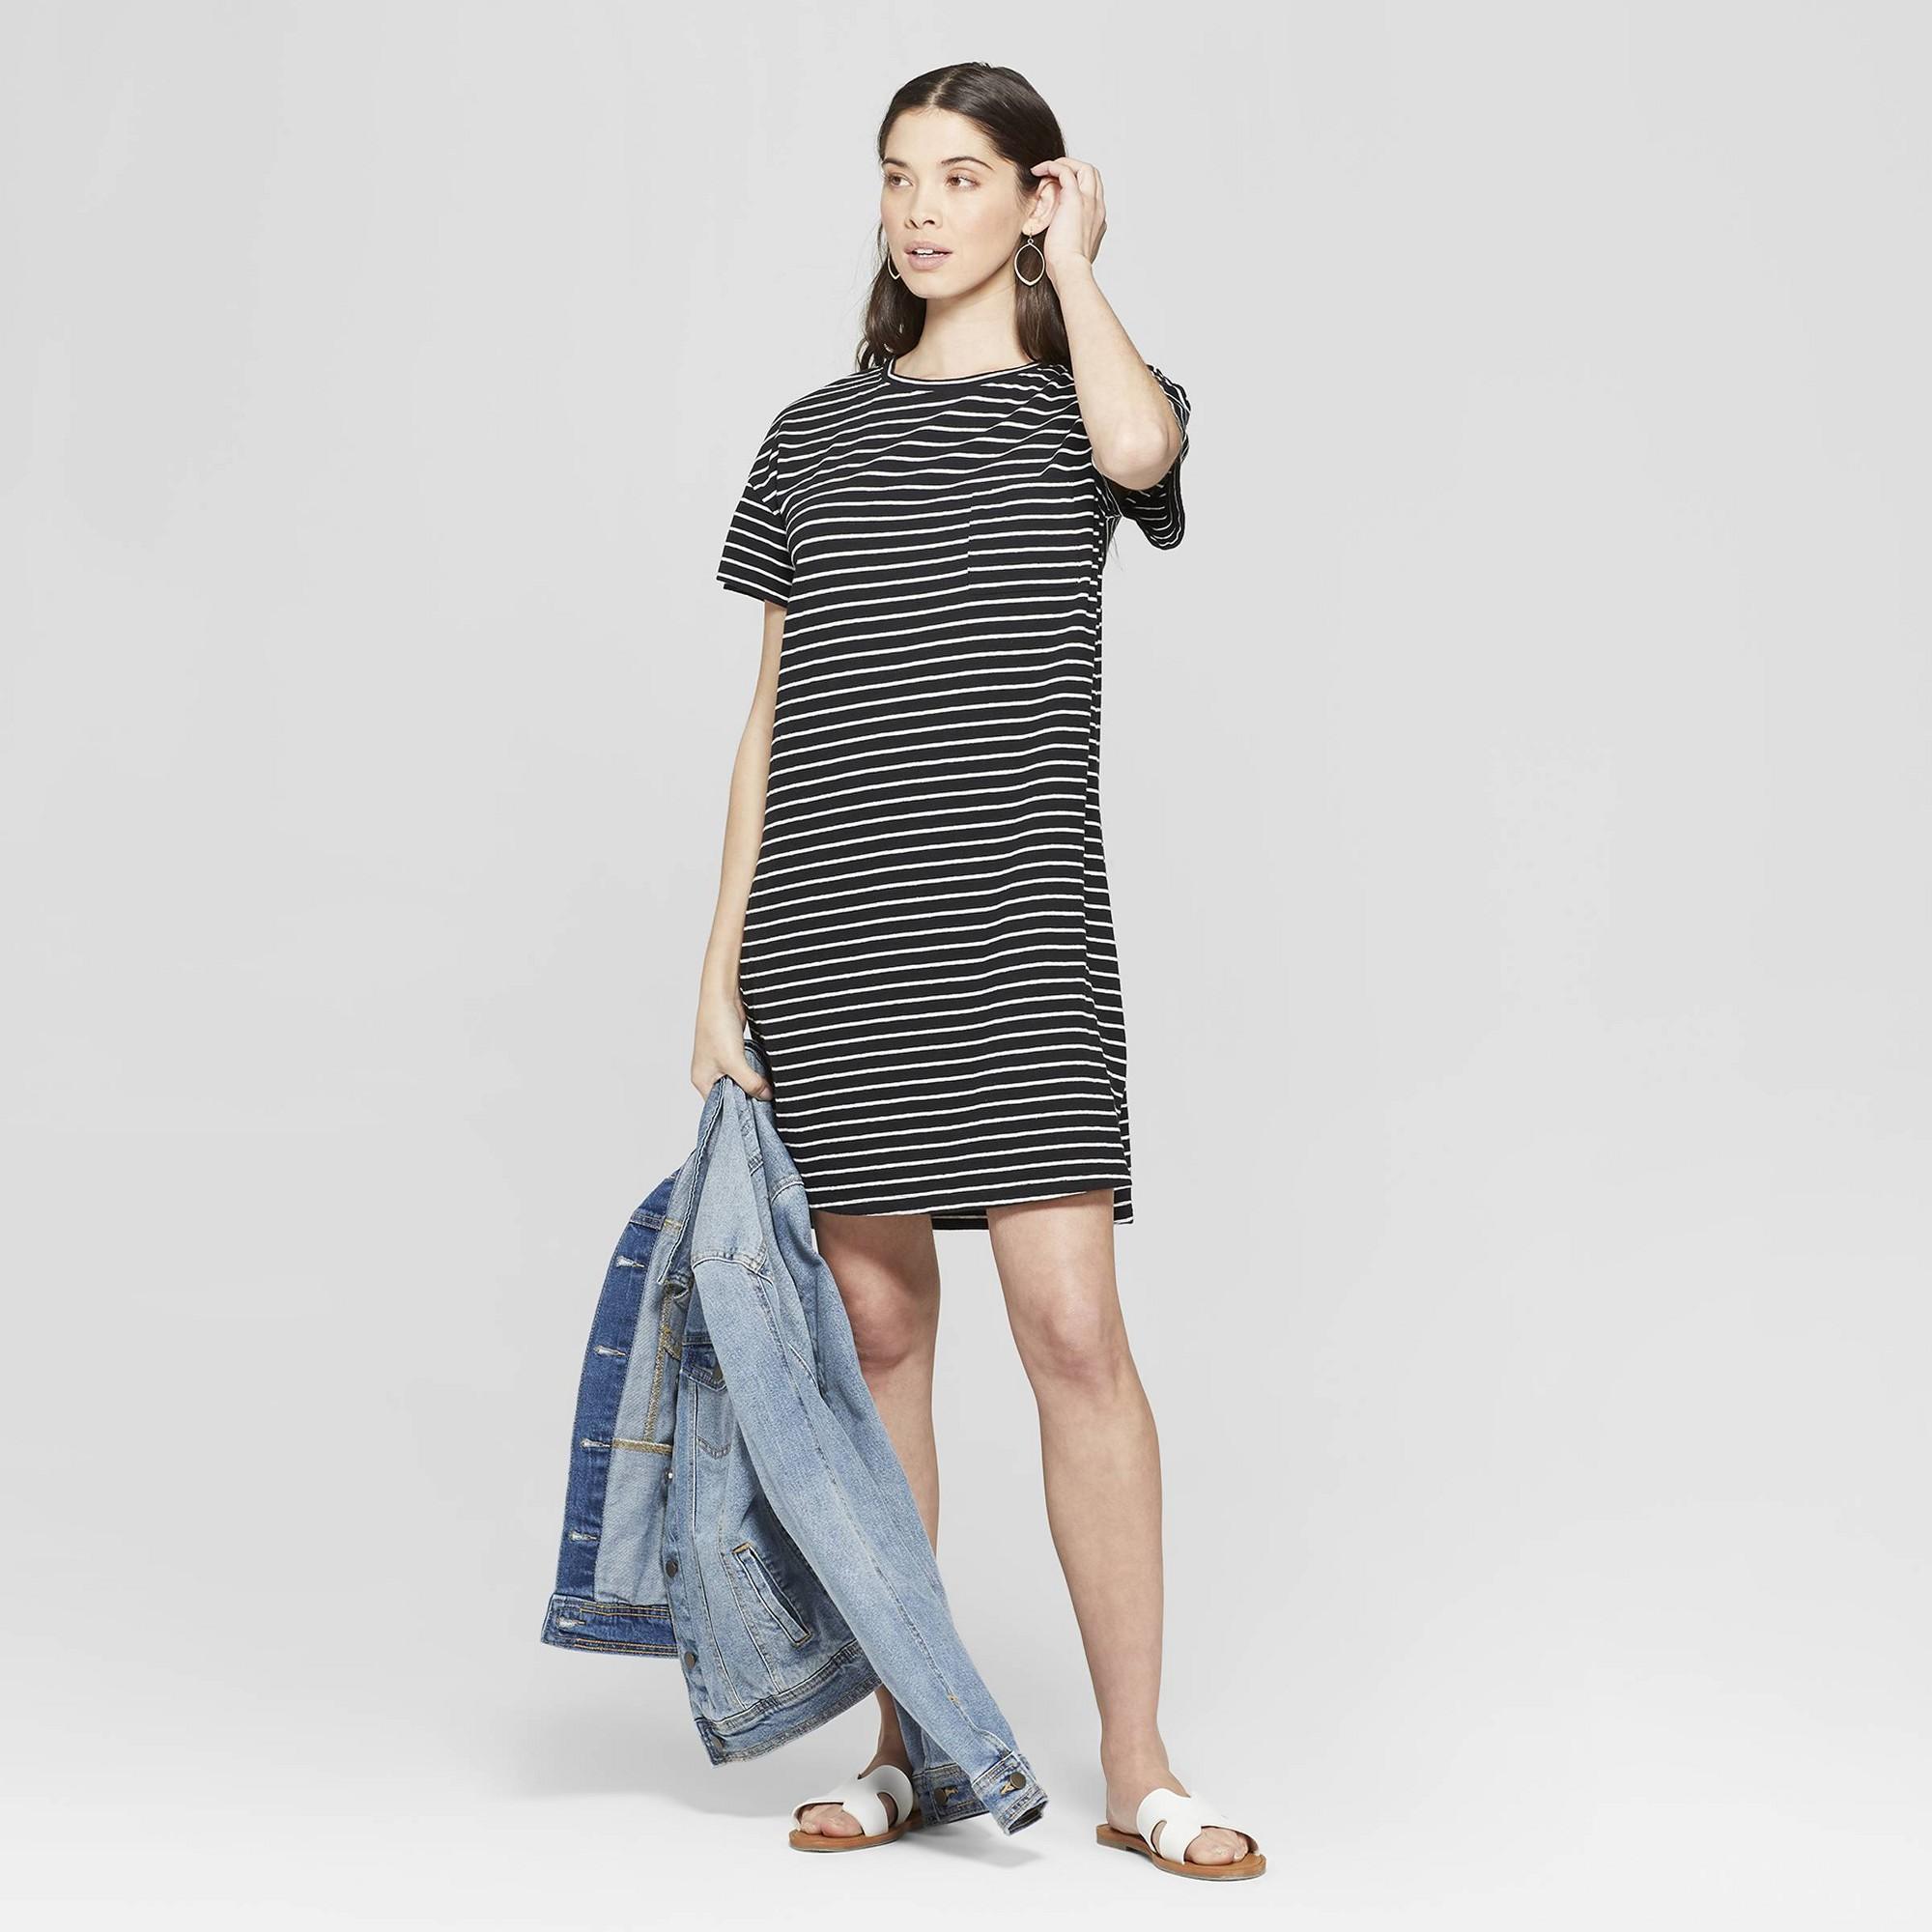 590f1cf3d39f Women's Striped Short Sleeve V-Neck T-Shirt Dress - Universal Thread Black/White  Xxl